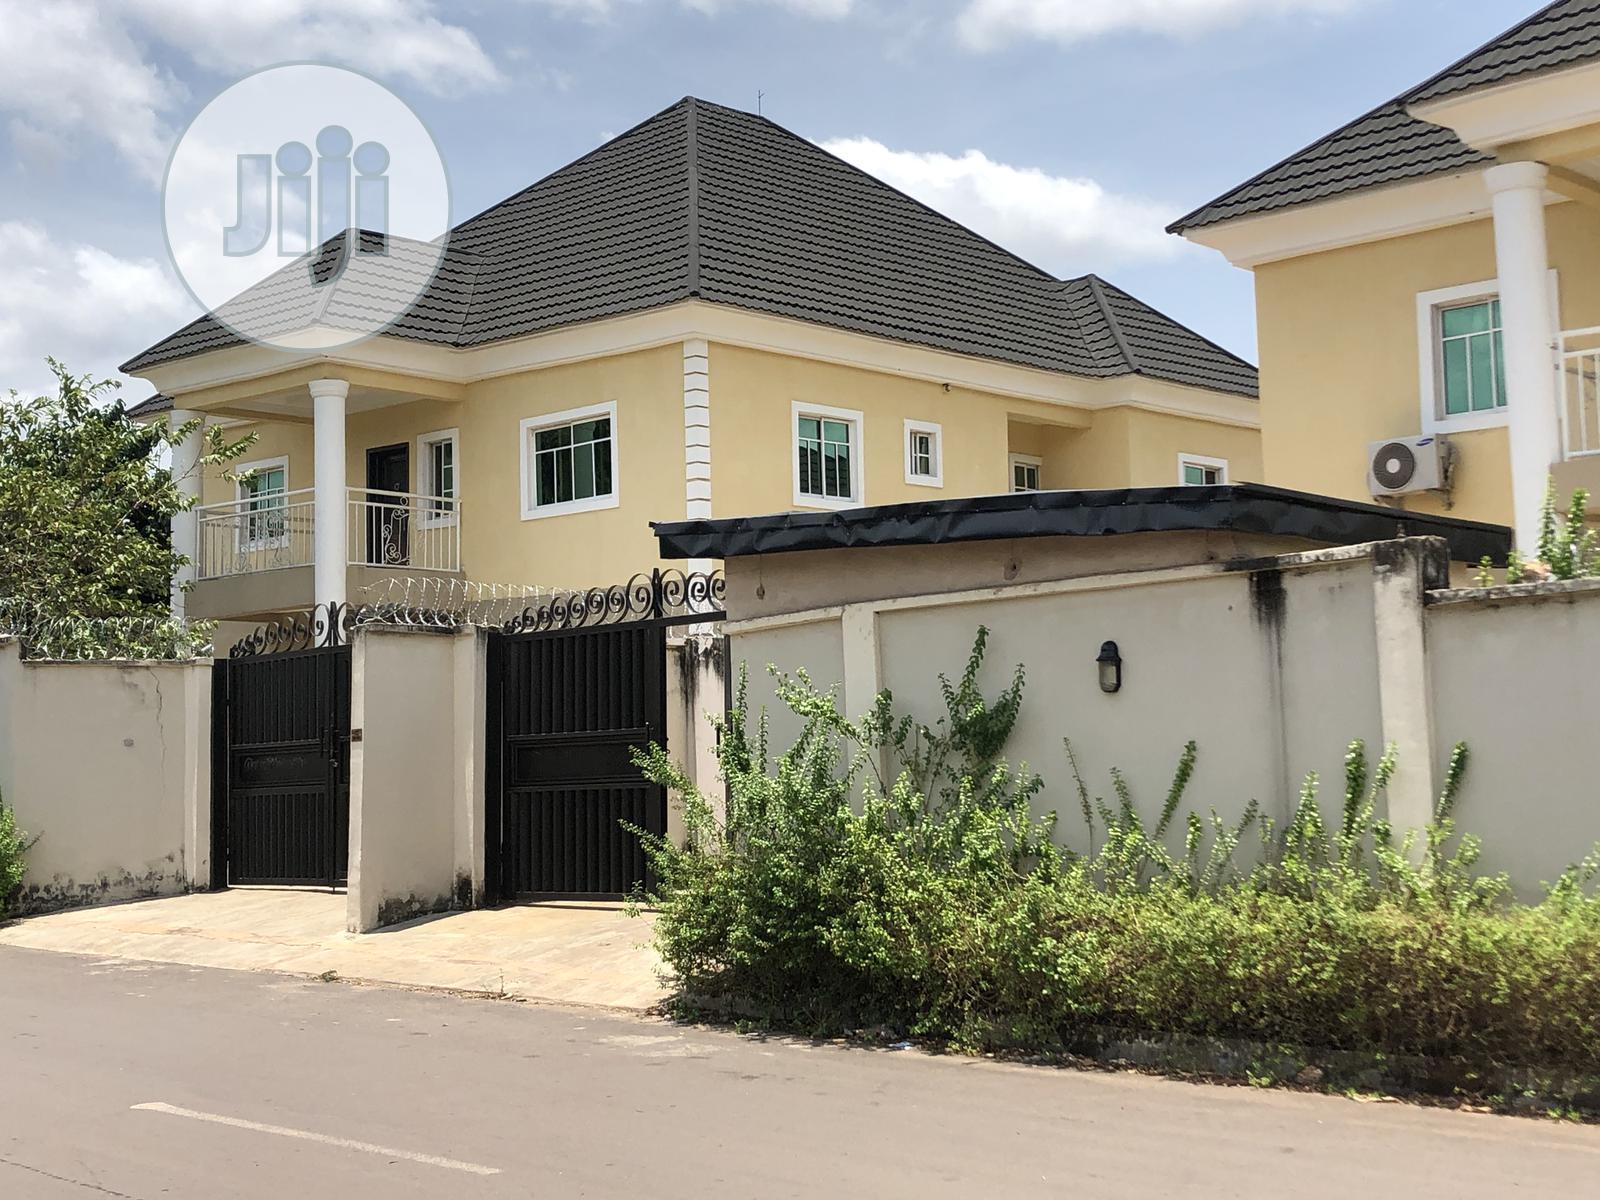 6 Bedrooms Duplex for Sale Enugu / Enugu   Houses & Apartments For Sale for sale in Enugu, Enugu State, Nigeria